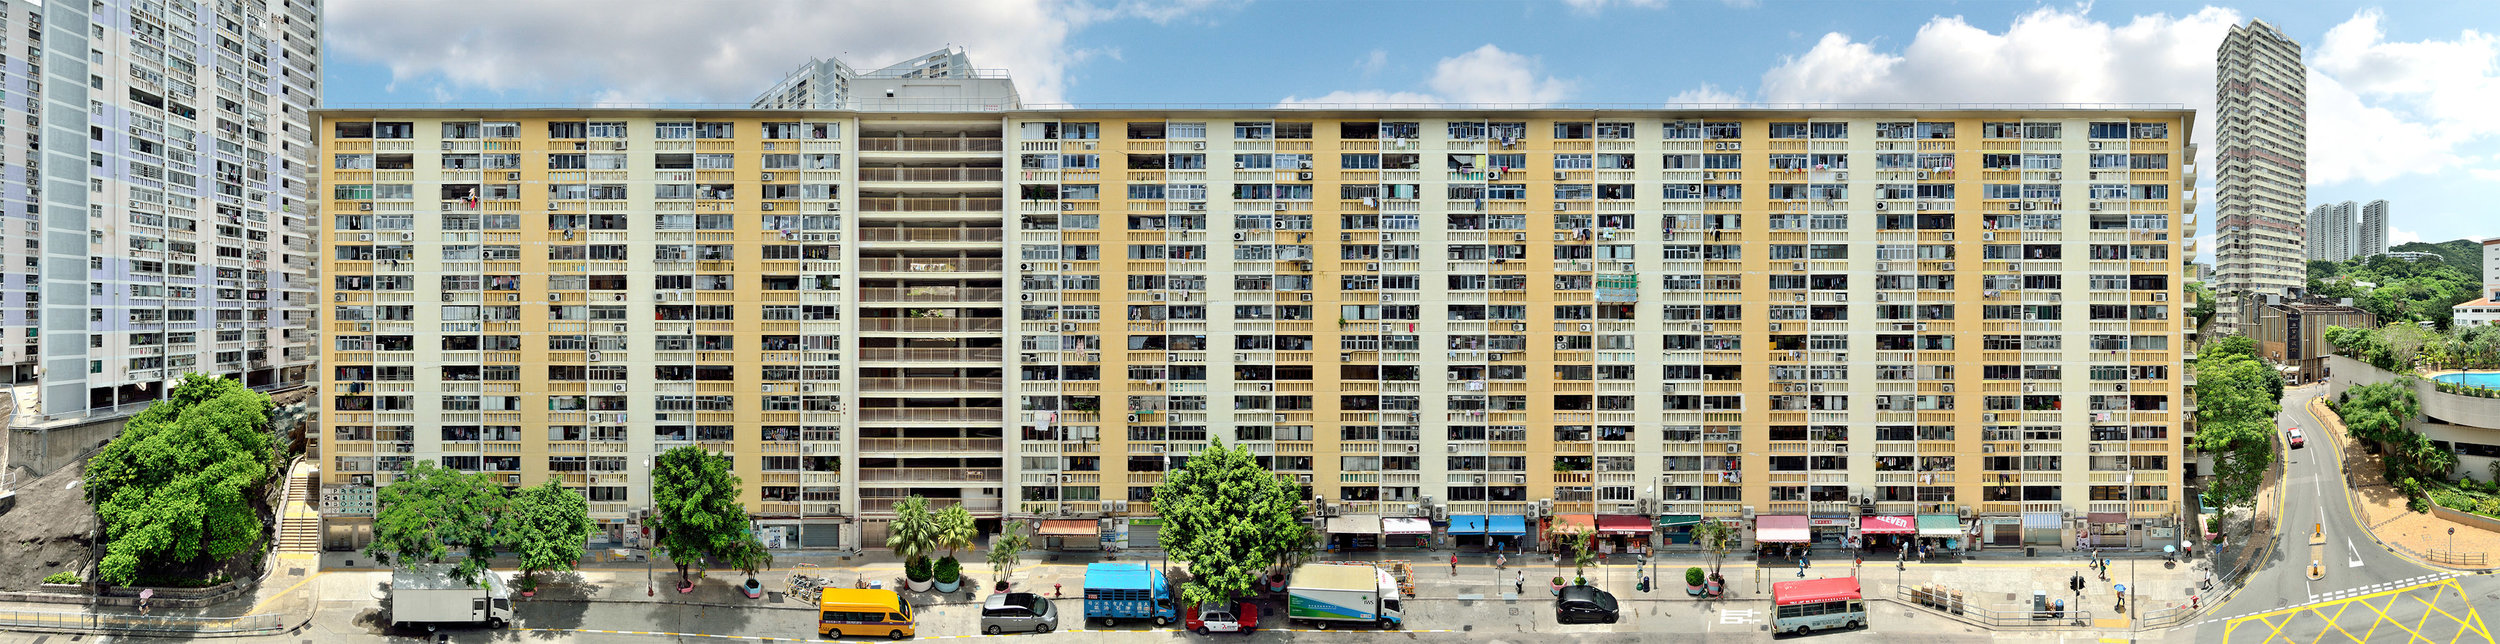 Stefan Irvine 'Wah Fu Estate, Pok Fu Lam' (Hong Kong, 2017) Courtesy of Blue Lotus Gallery